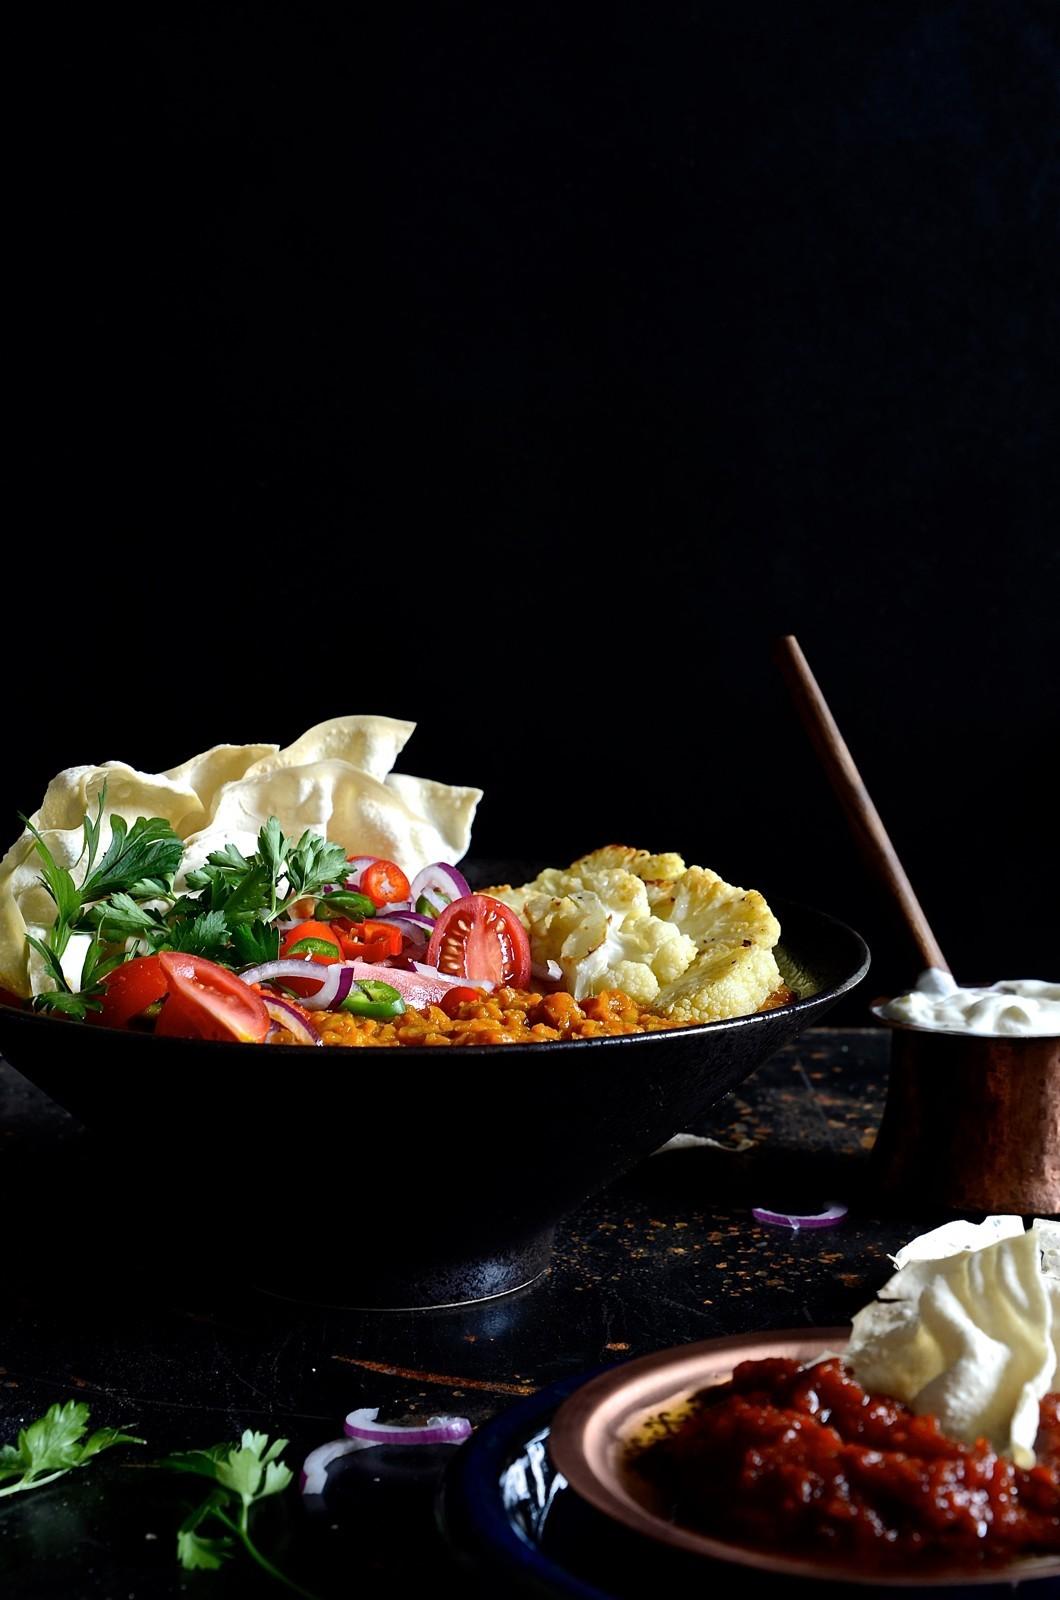 Tarka Dahl with roasted cauliflower